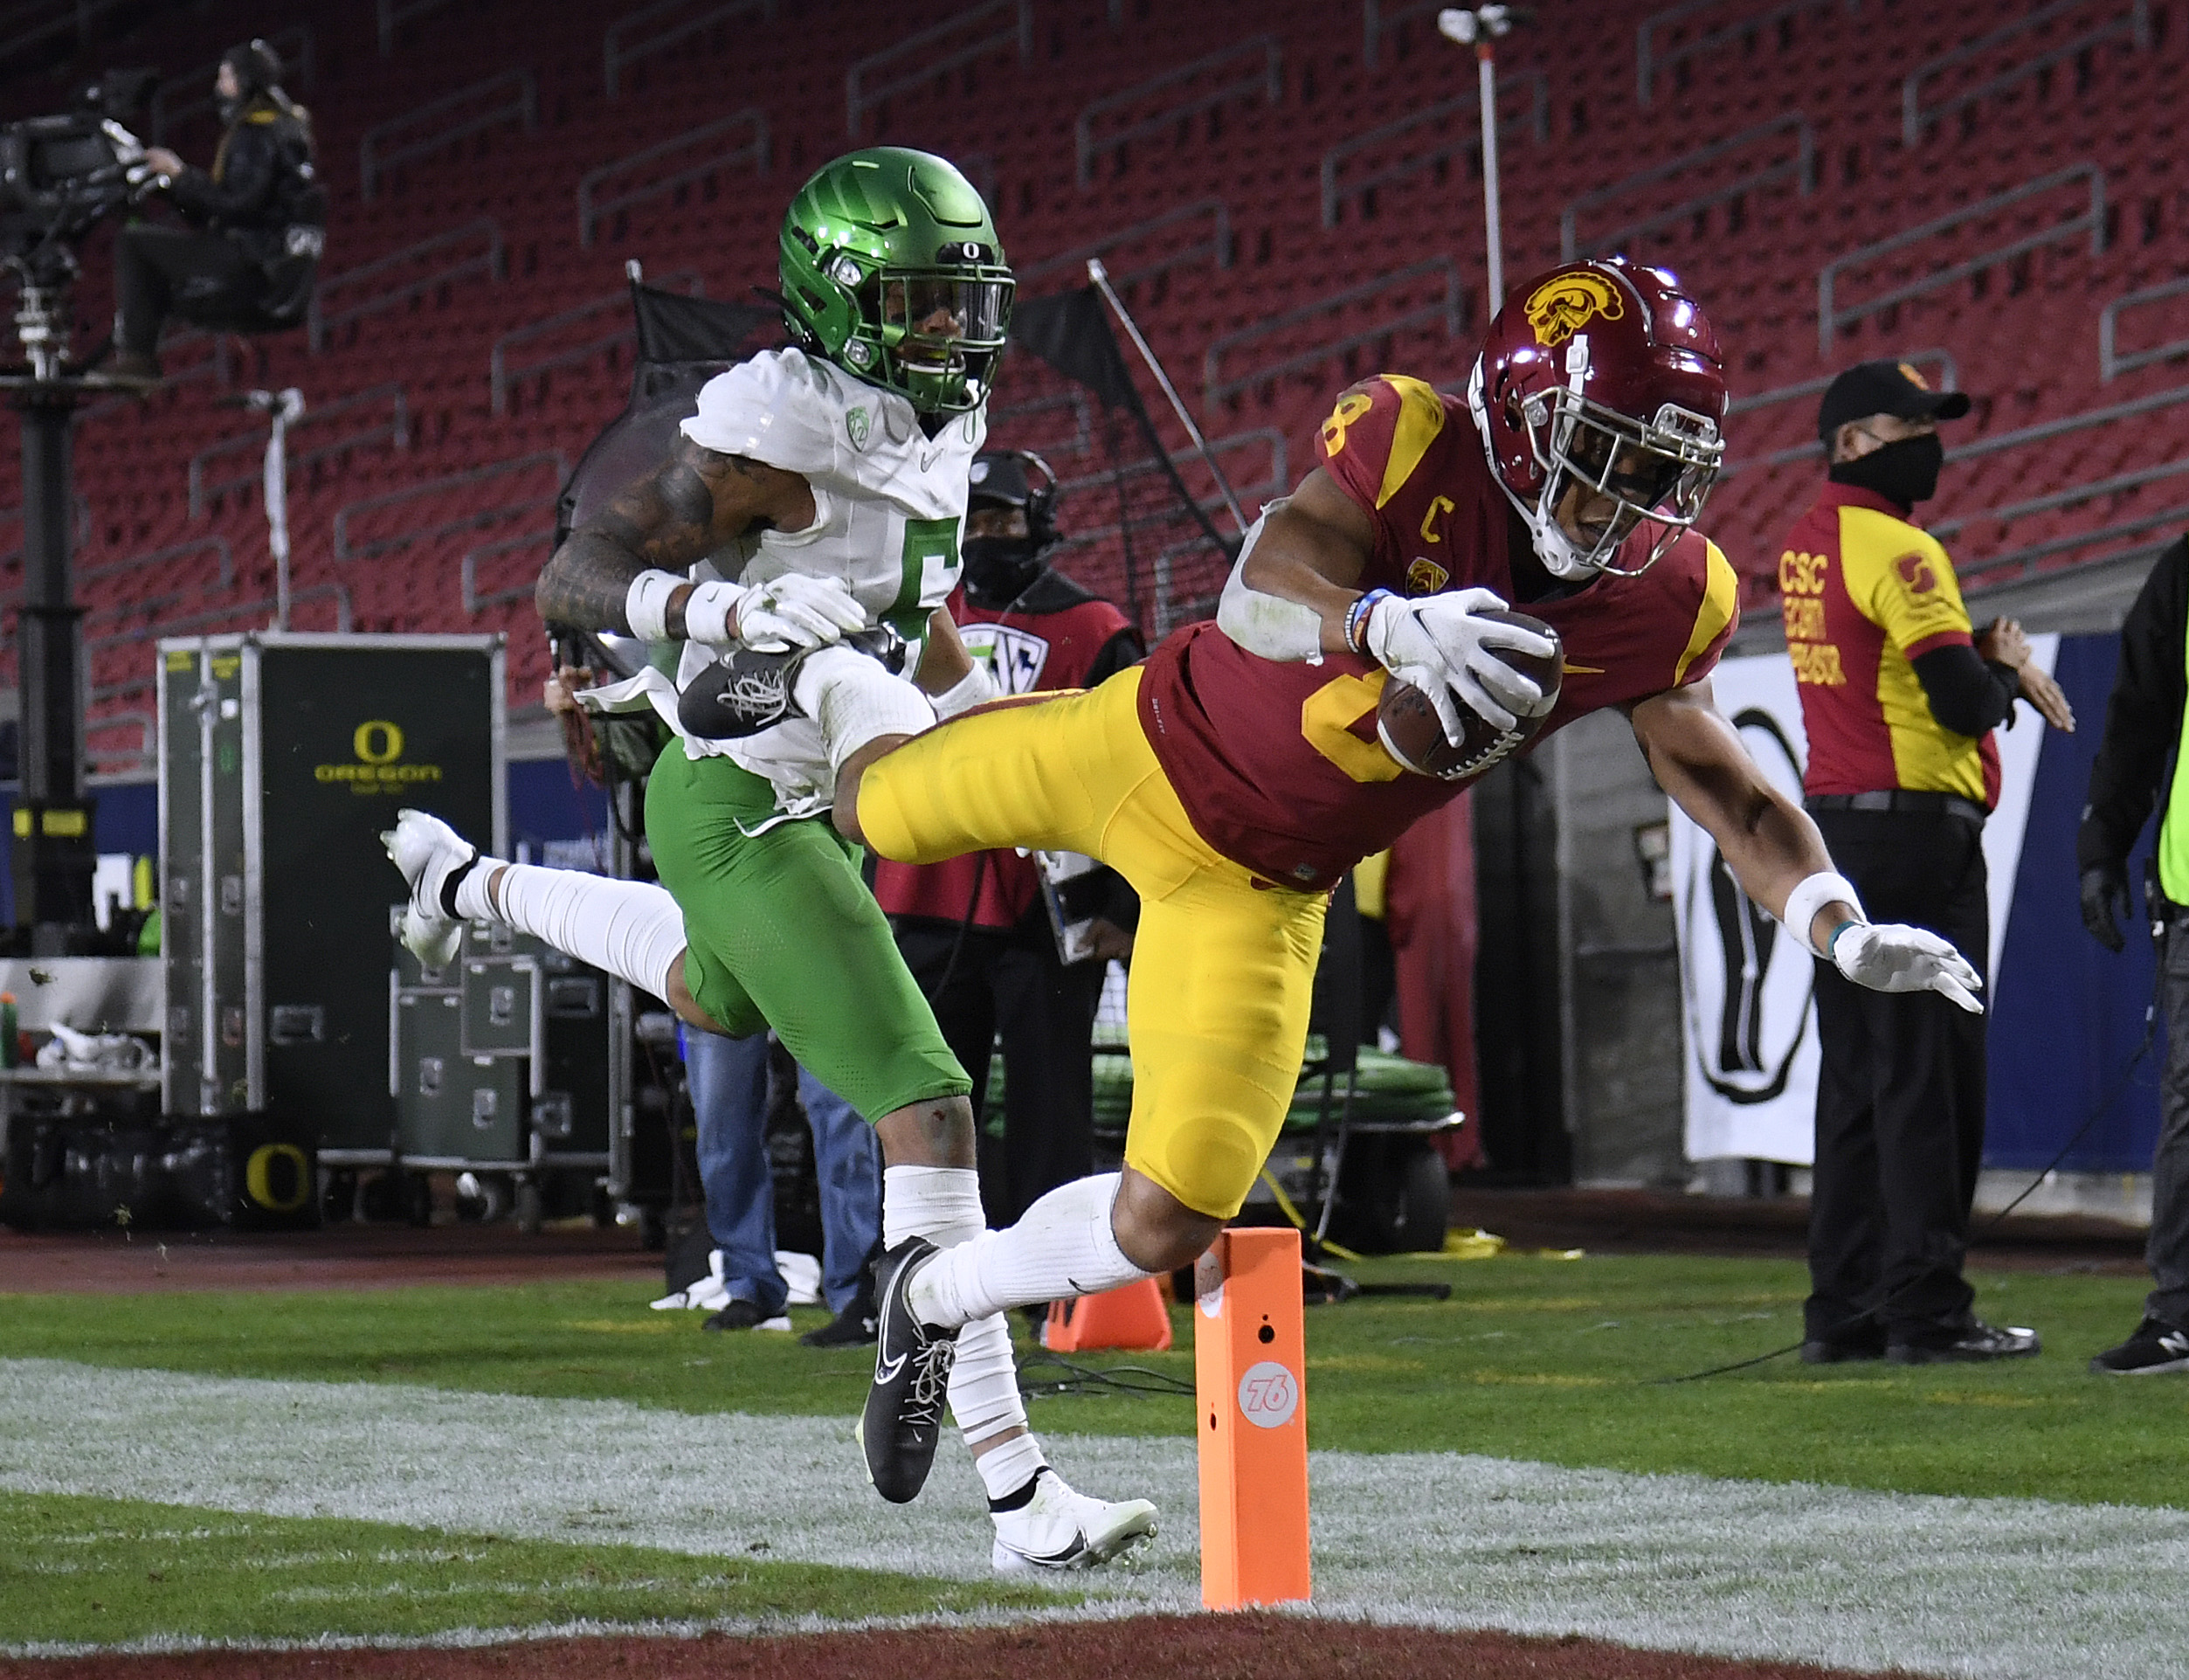 Pac 12 Championship - Oregon v USC